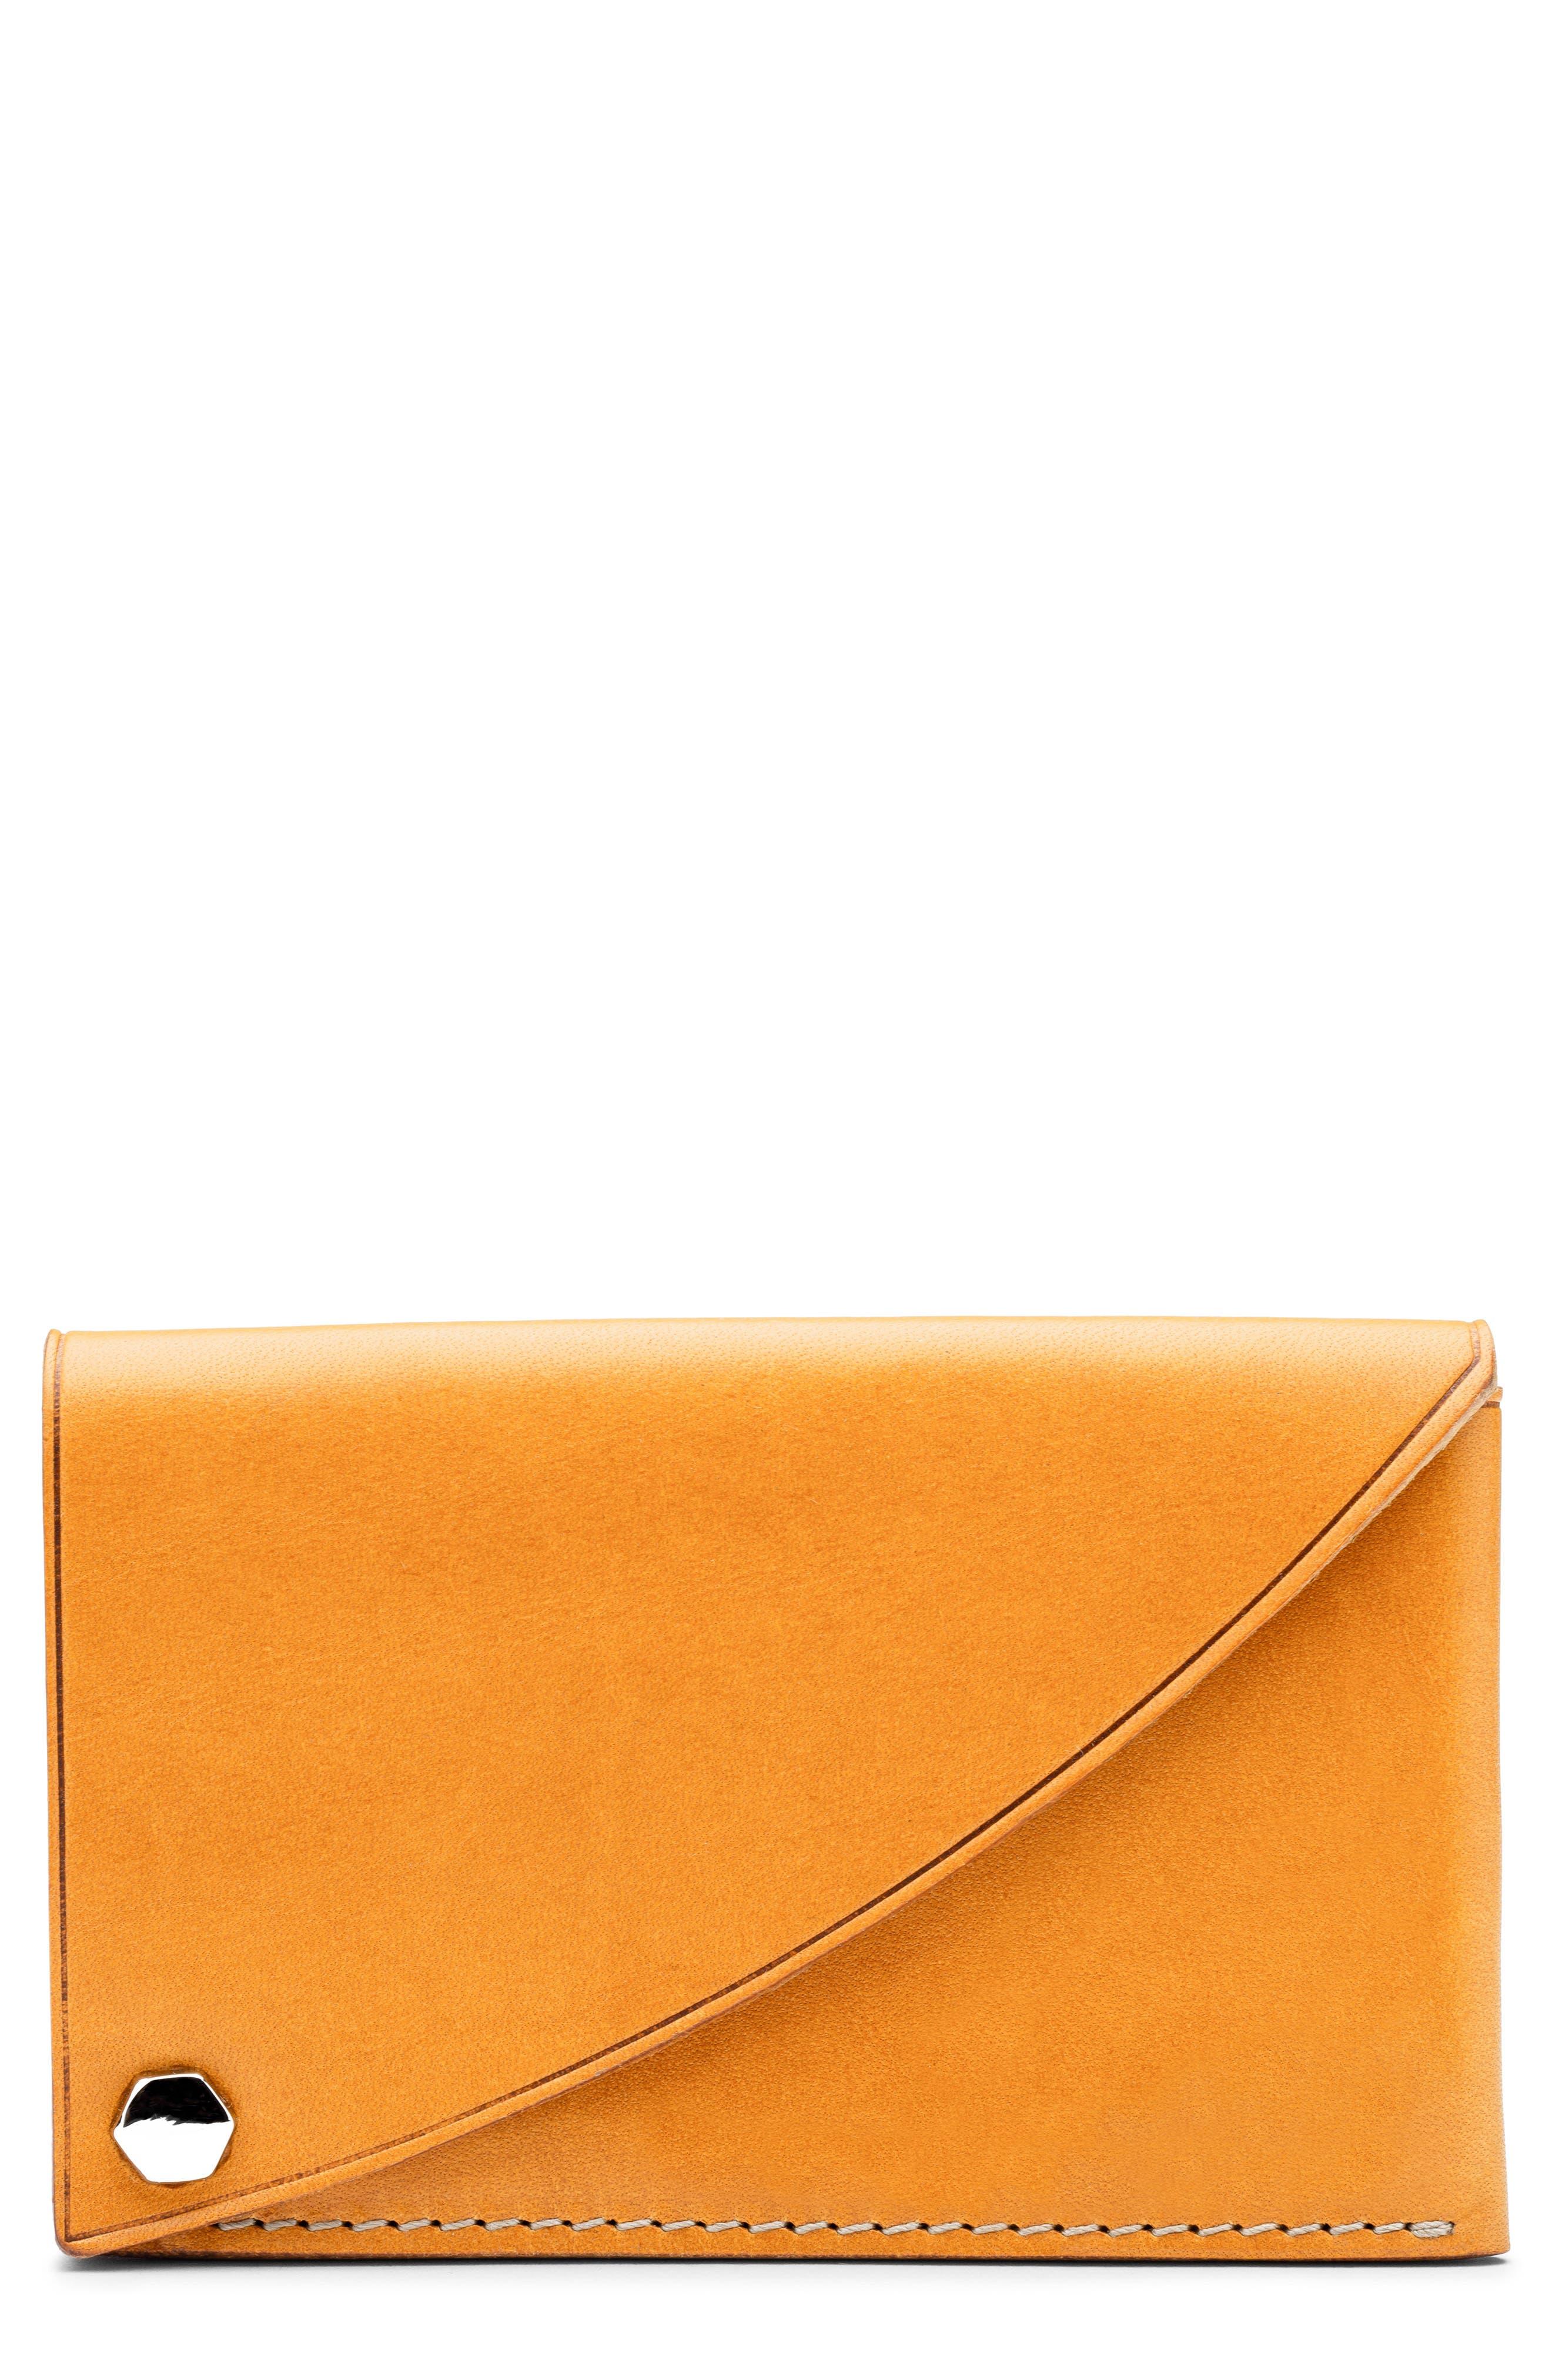 Italo Leather Flipper Card Case